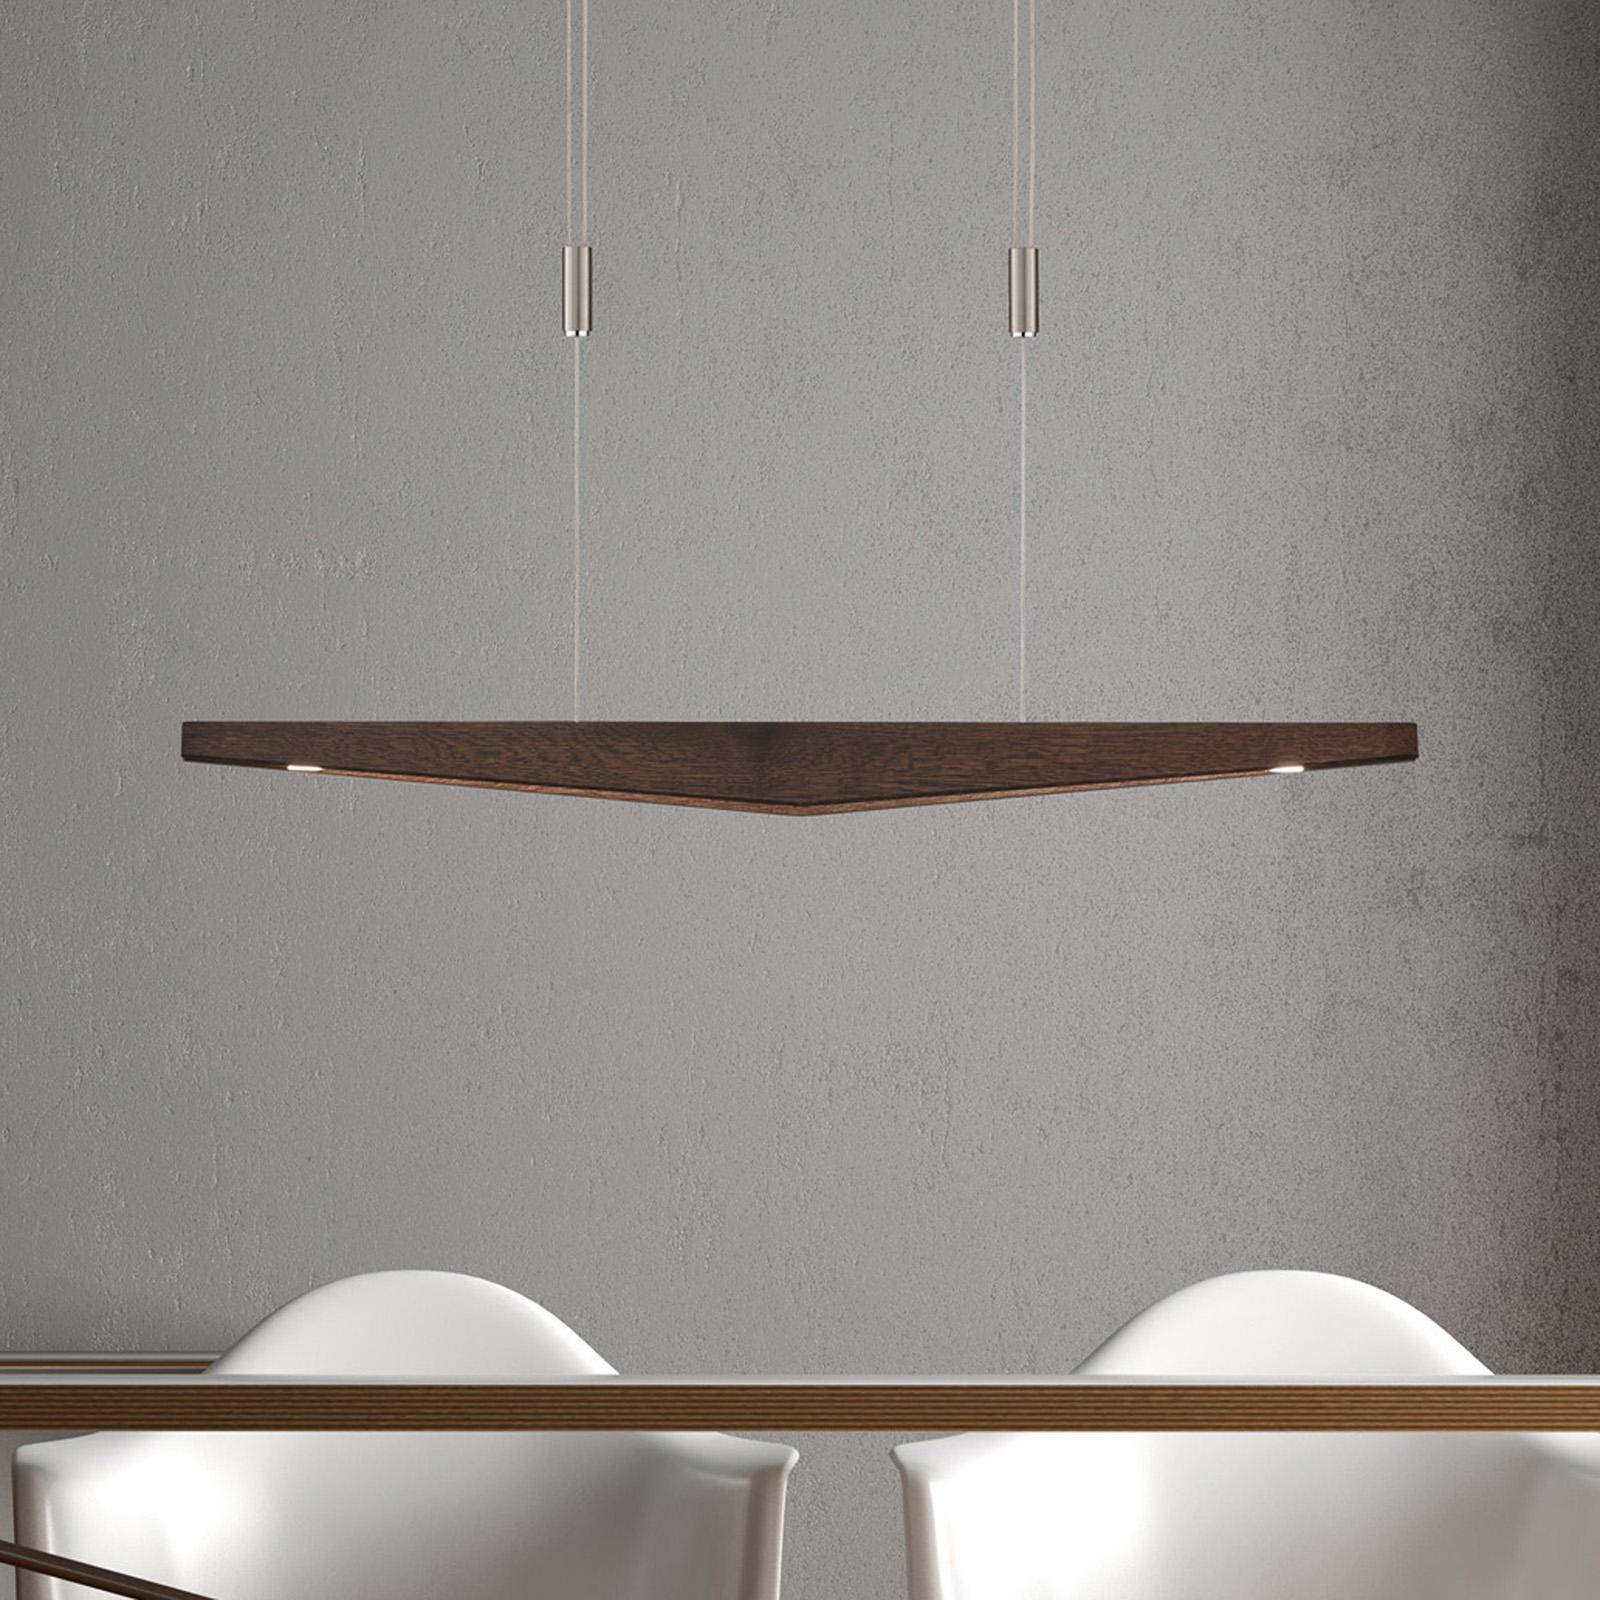 Lucande Dila LED-pendellampa ek kolonial 88 cm